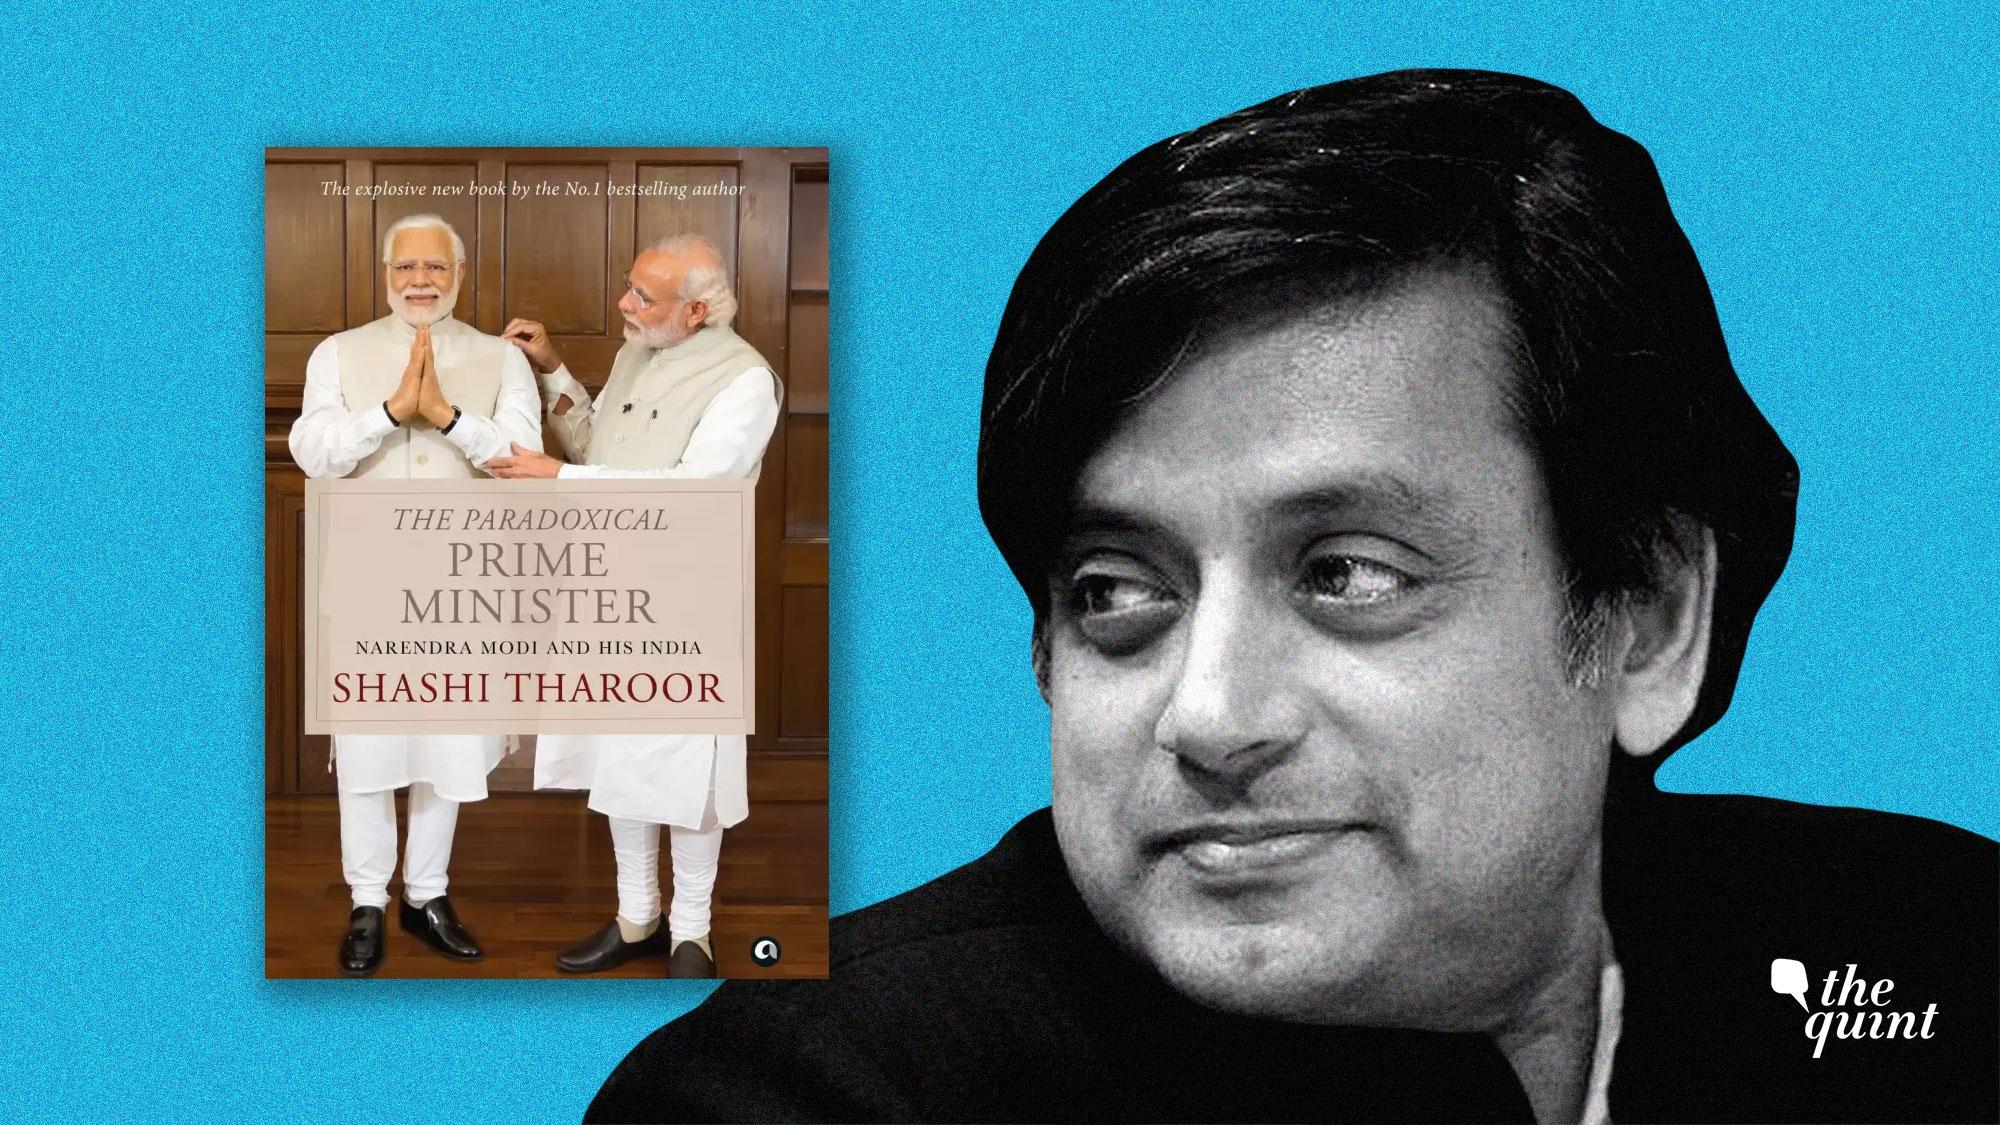 Shashi Tharoor Book On Narendra Modi The Paradoxical Prime